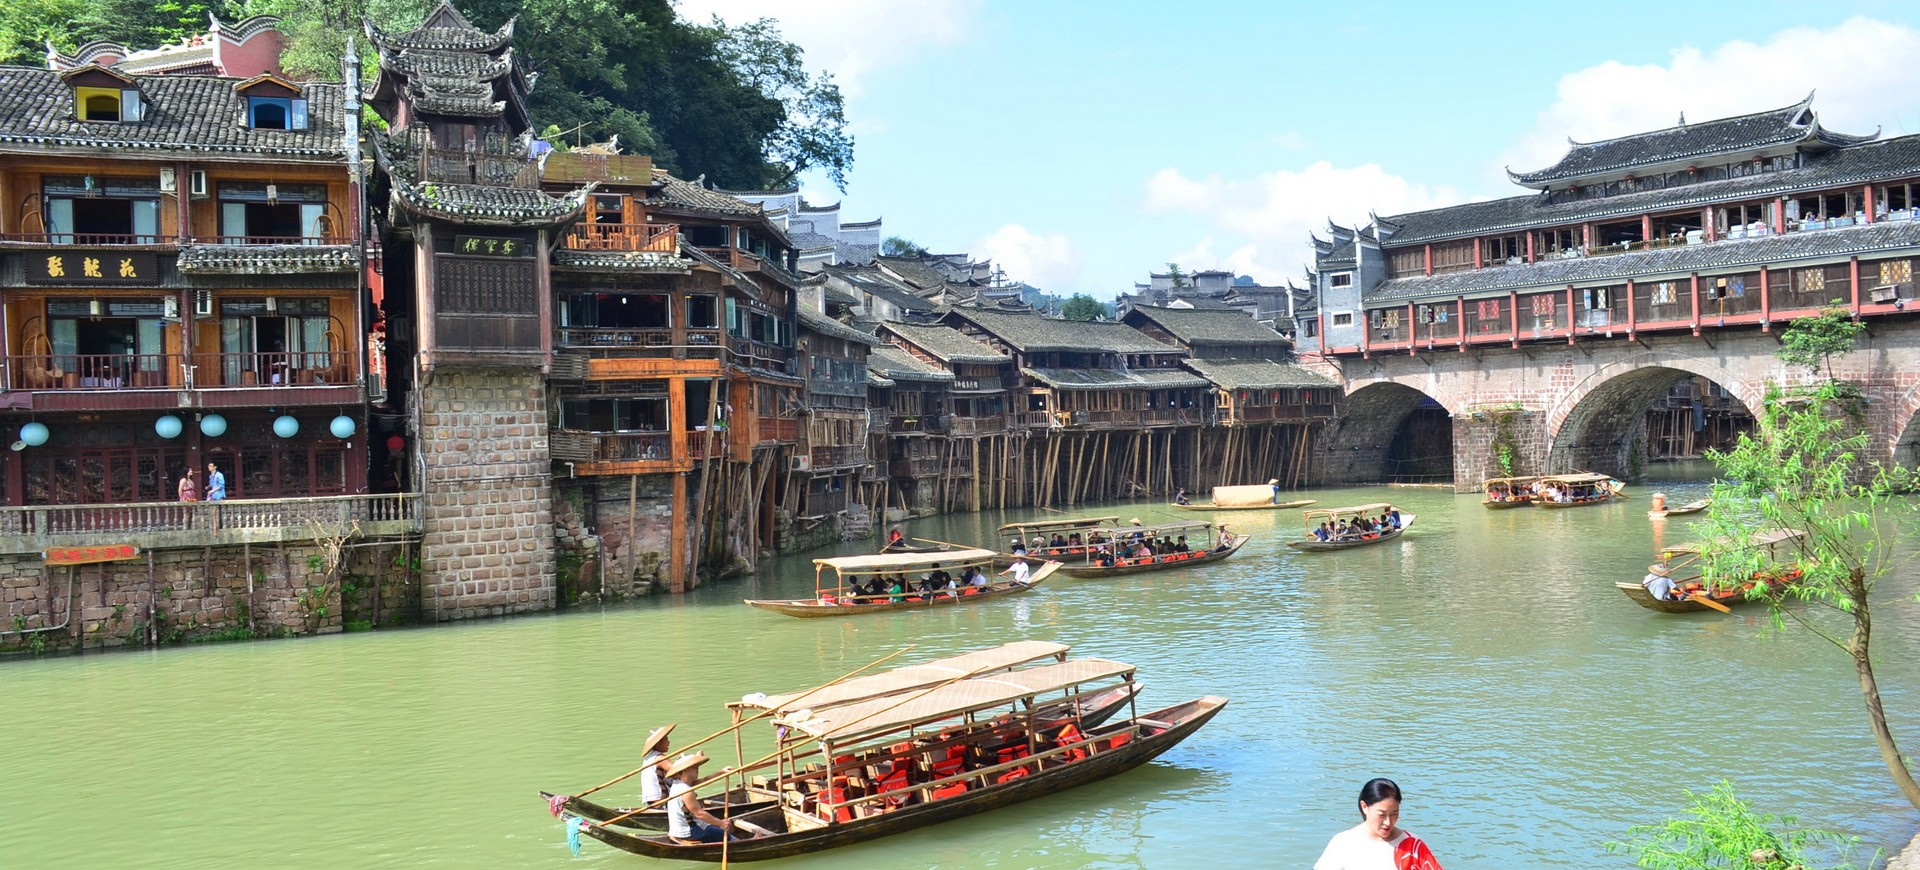 Fenghuang dans la Hunan en Chine